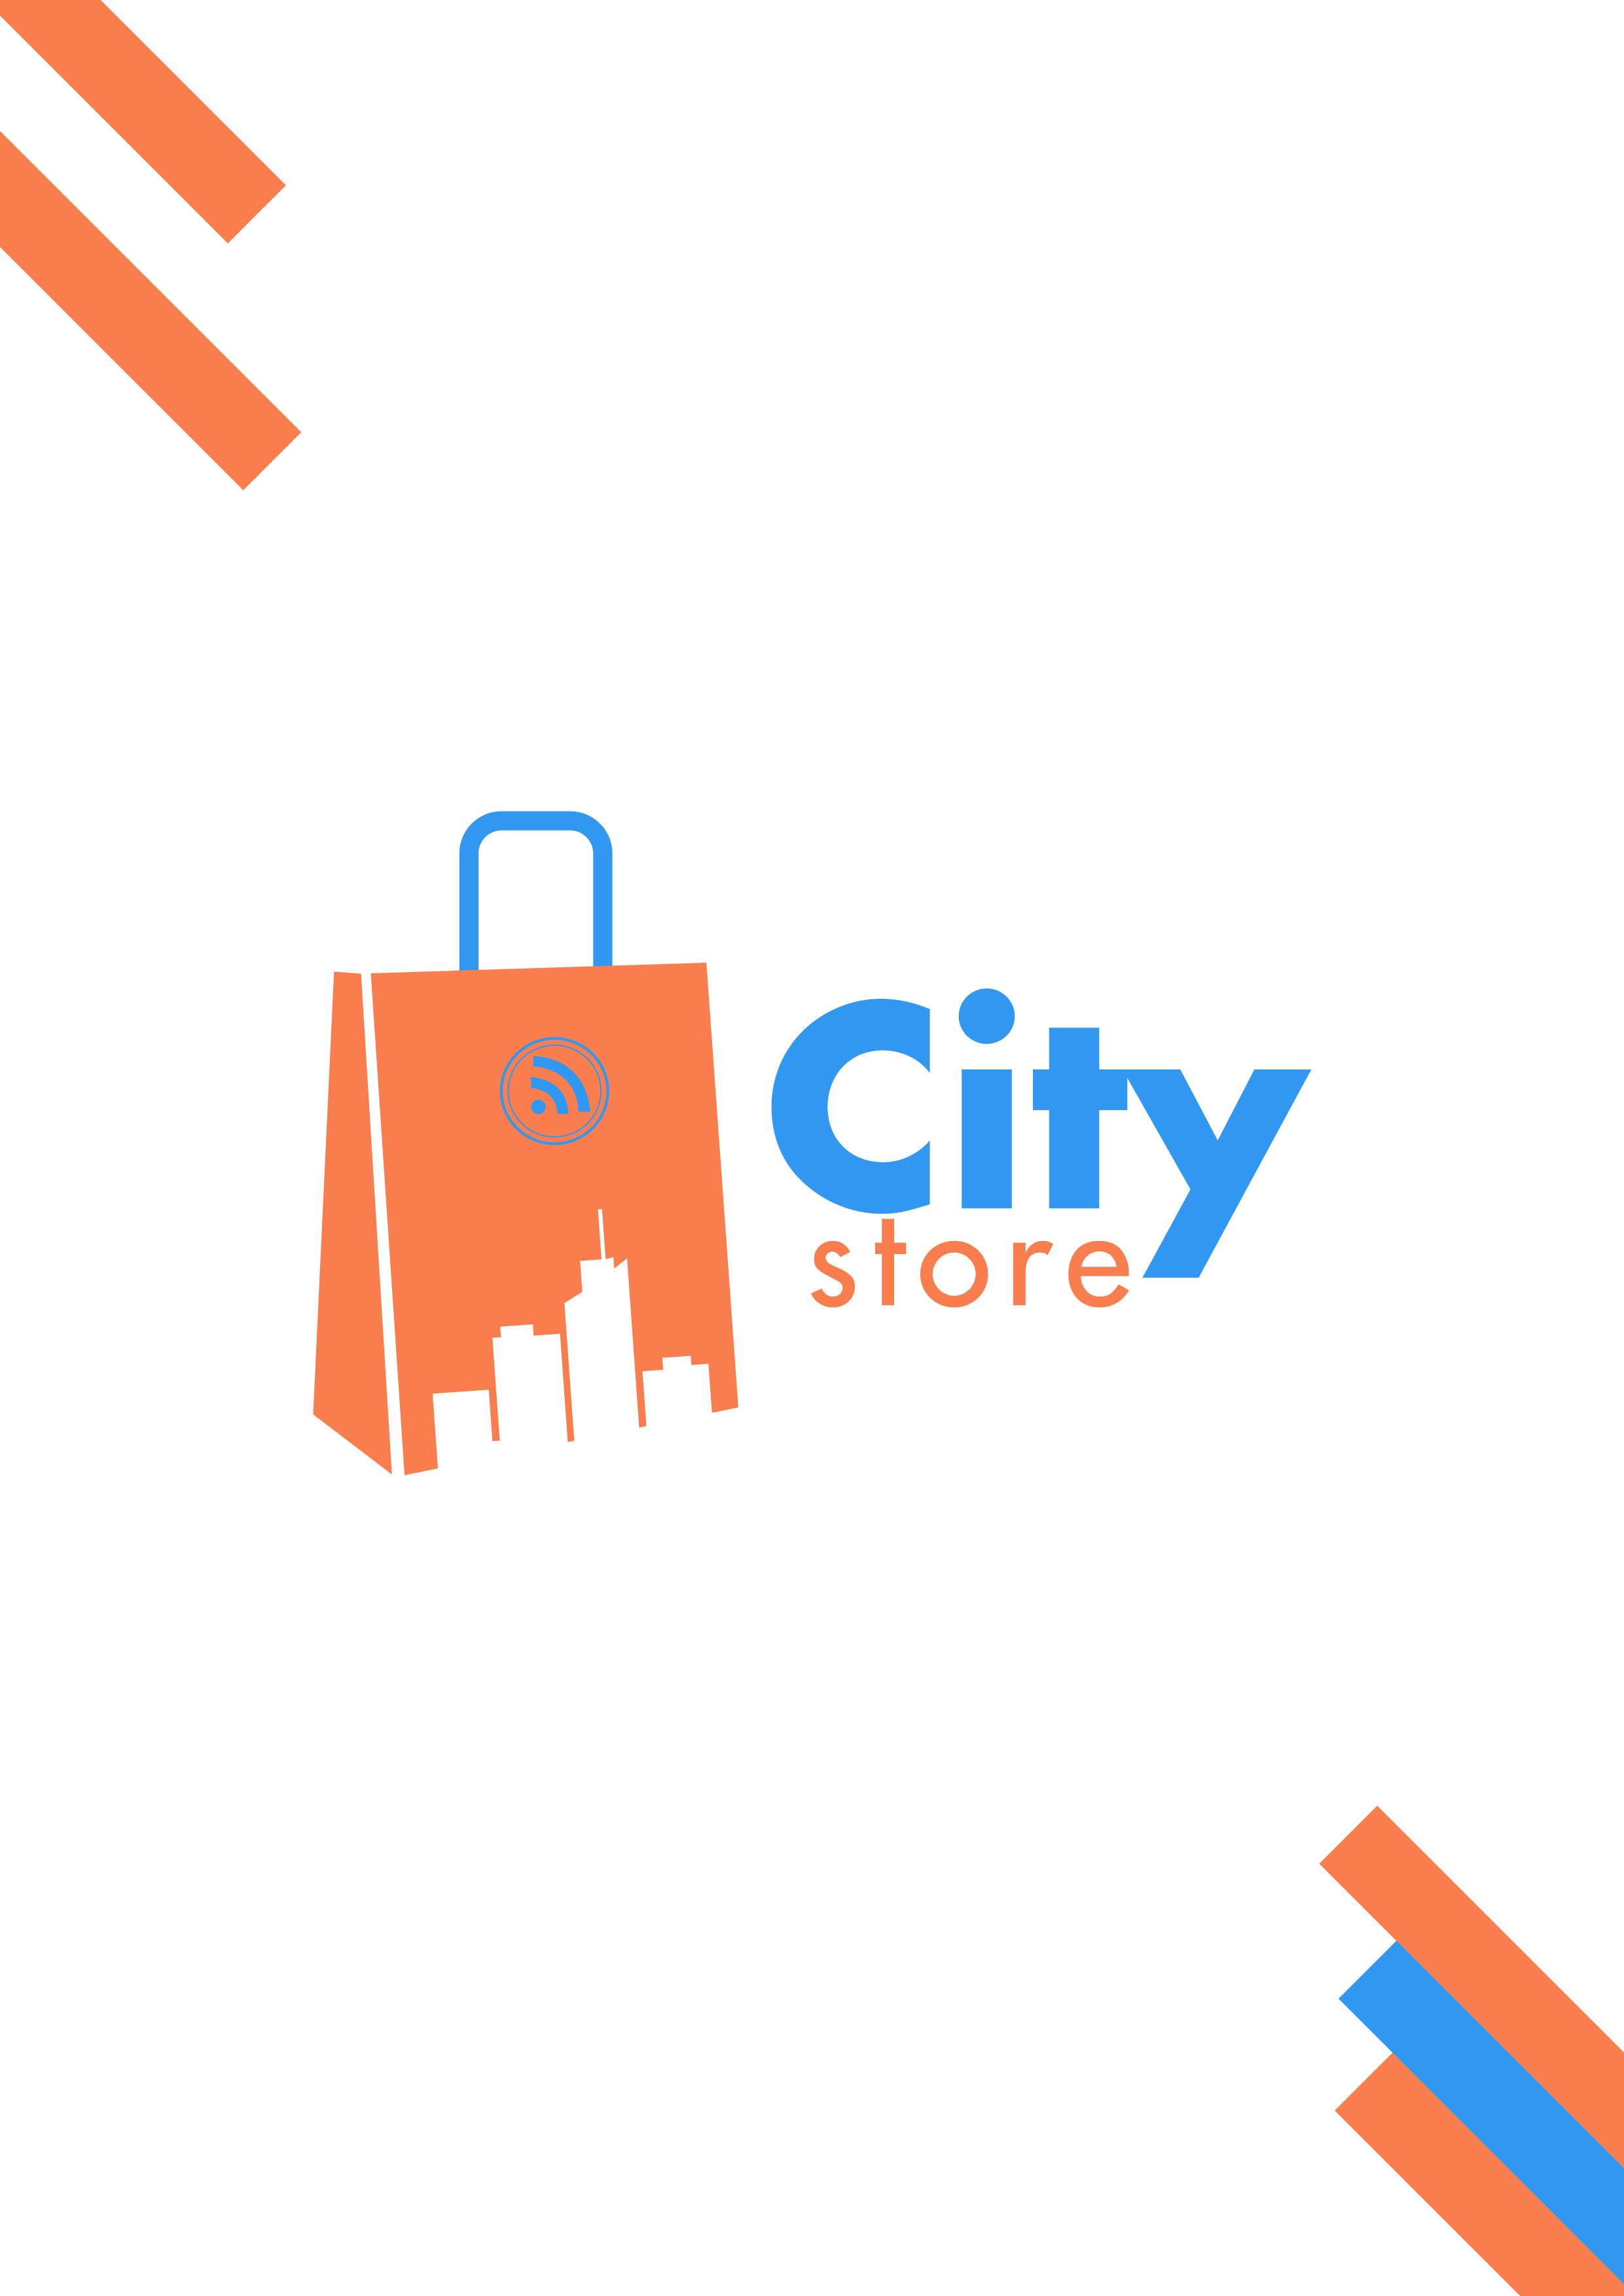 I will create a simple and unique letterhead